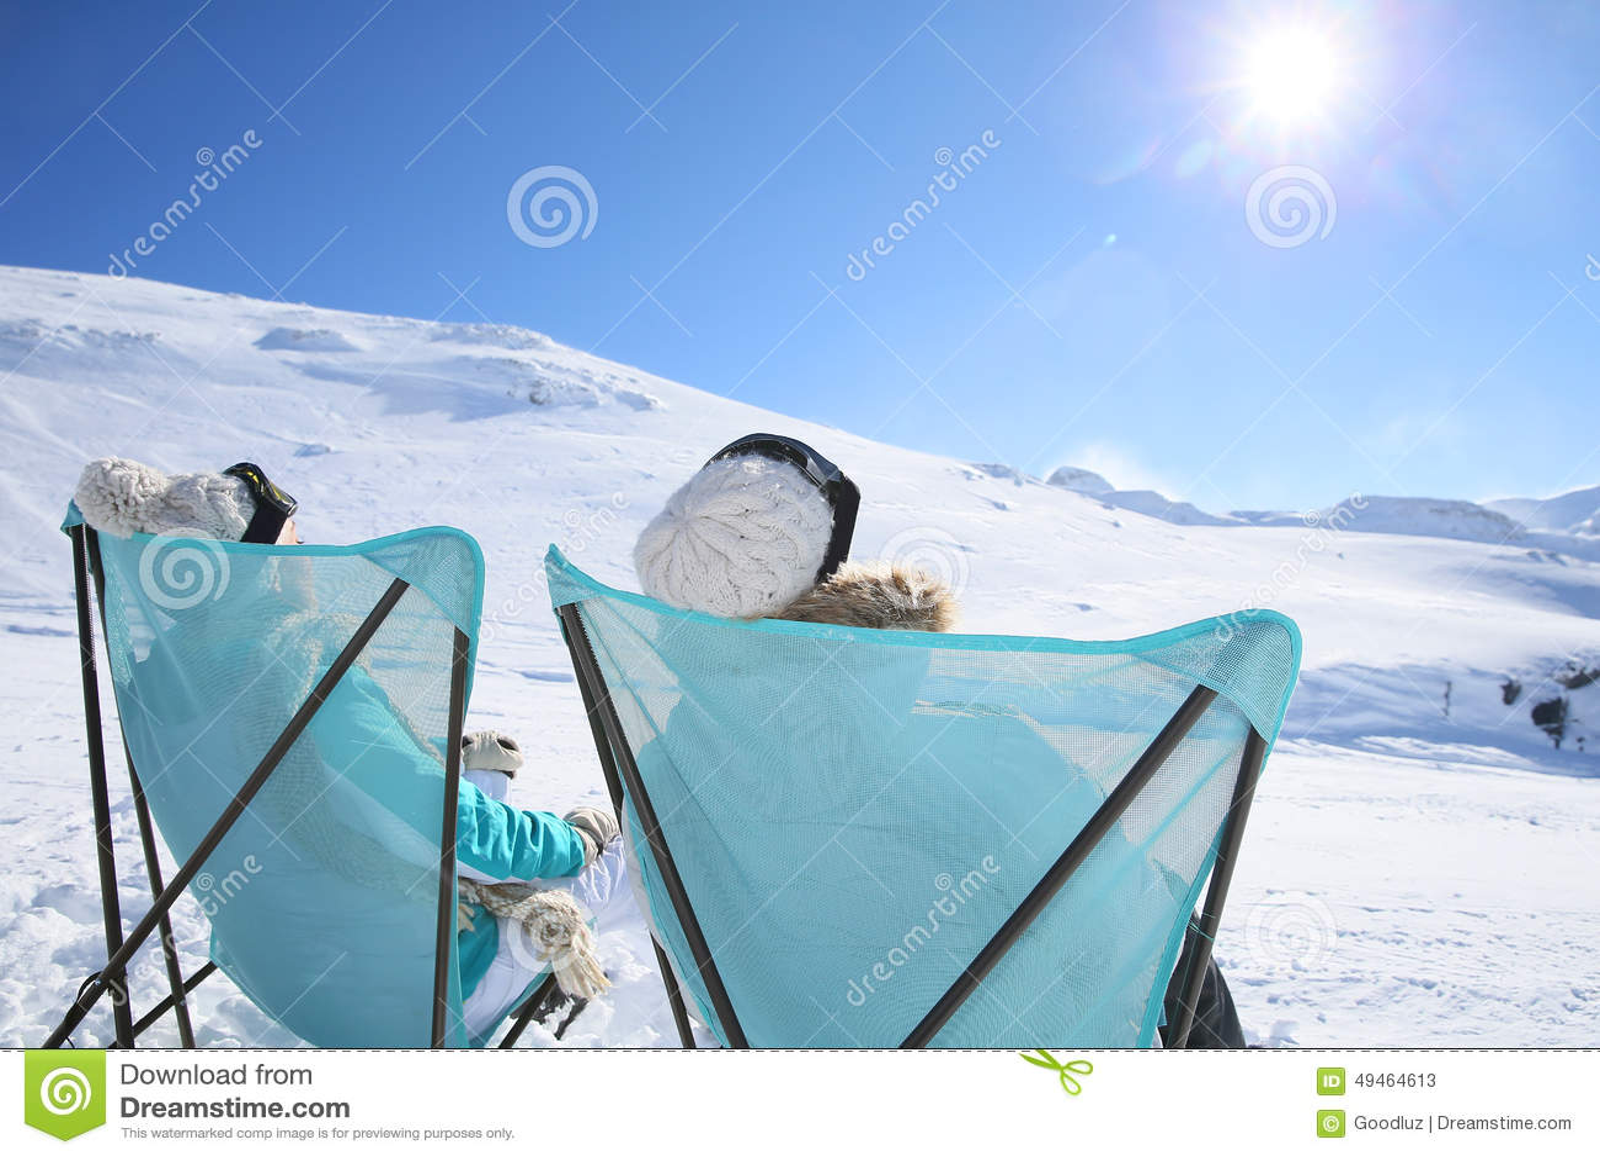 Backview of a couple taking sun on ski slopes